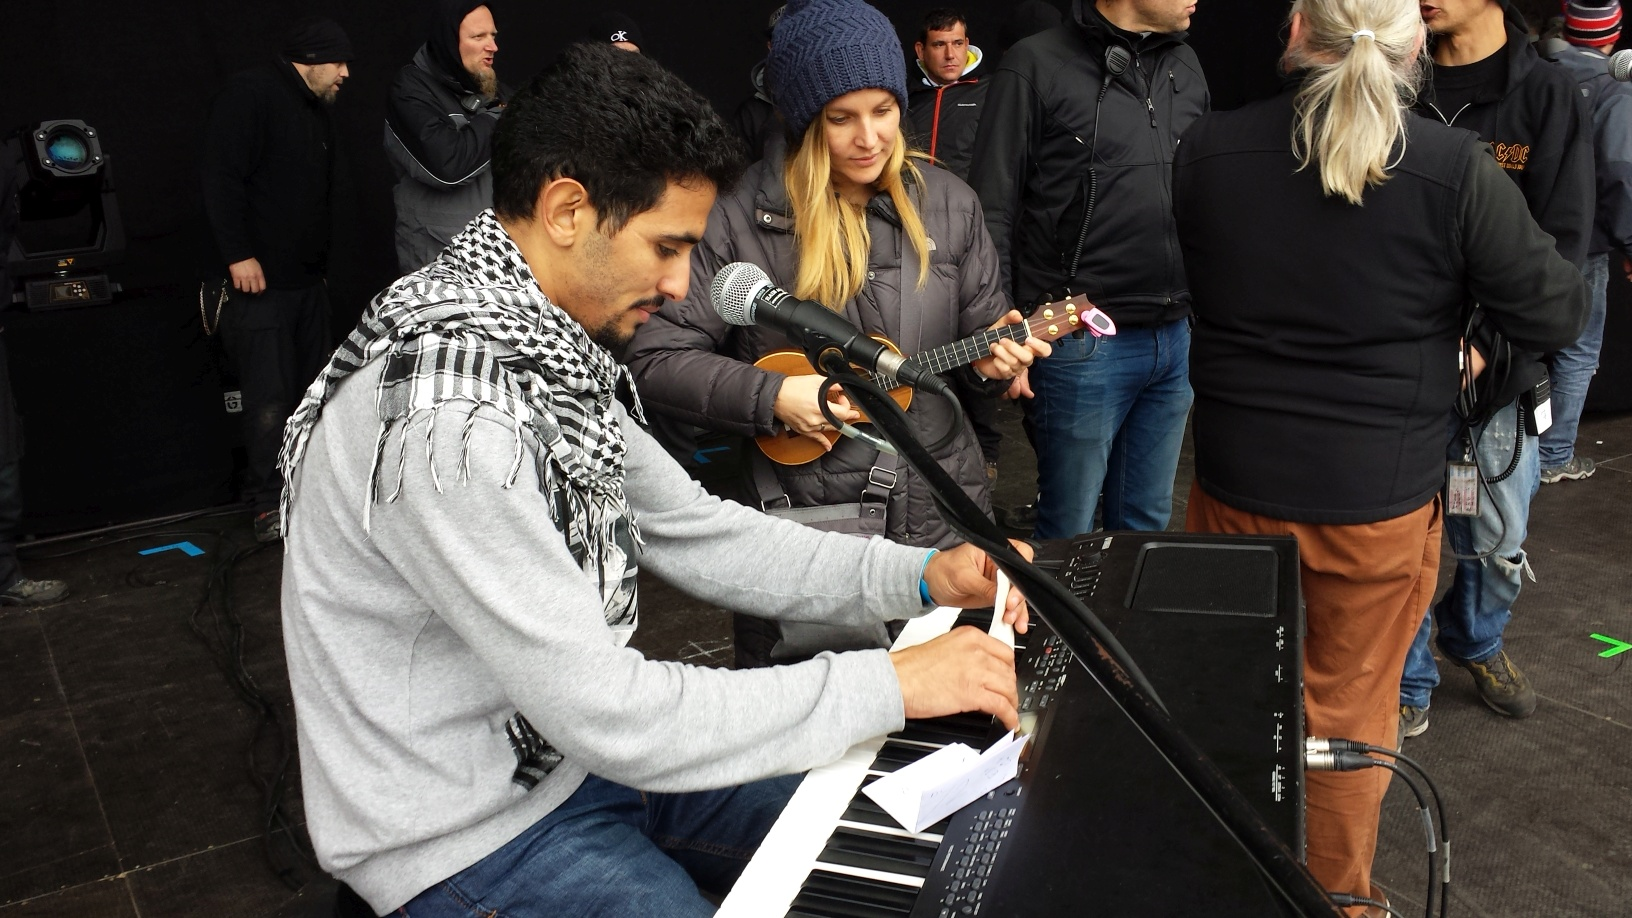 Aeham Ahmad: Ruf der Völker (Lyrics)